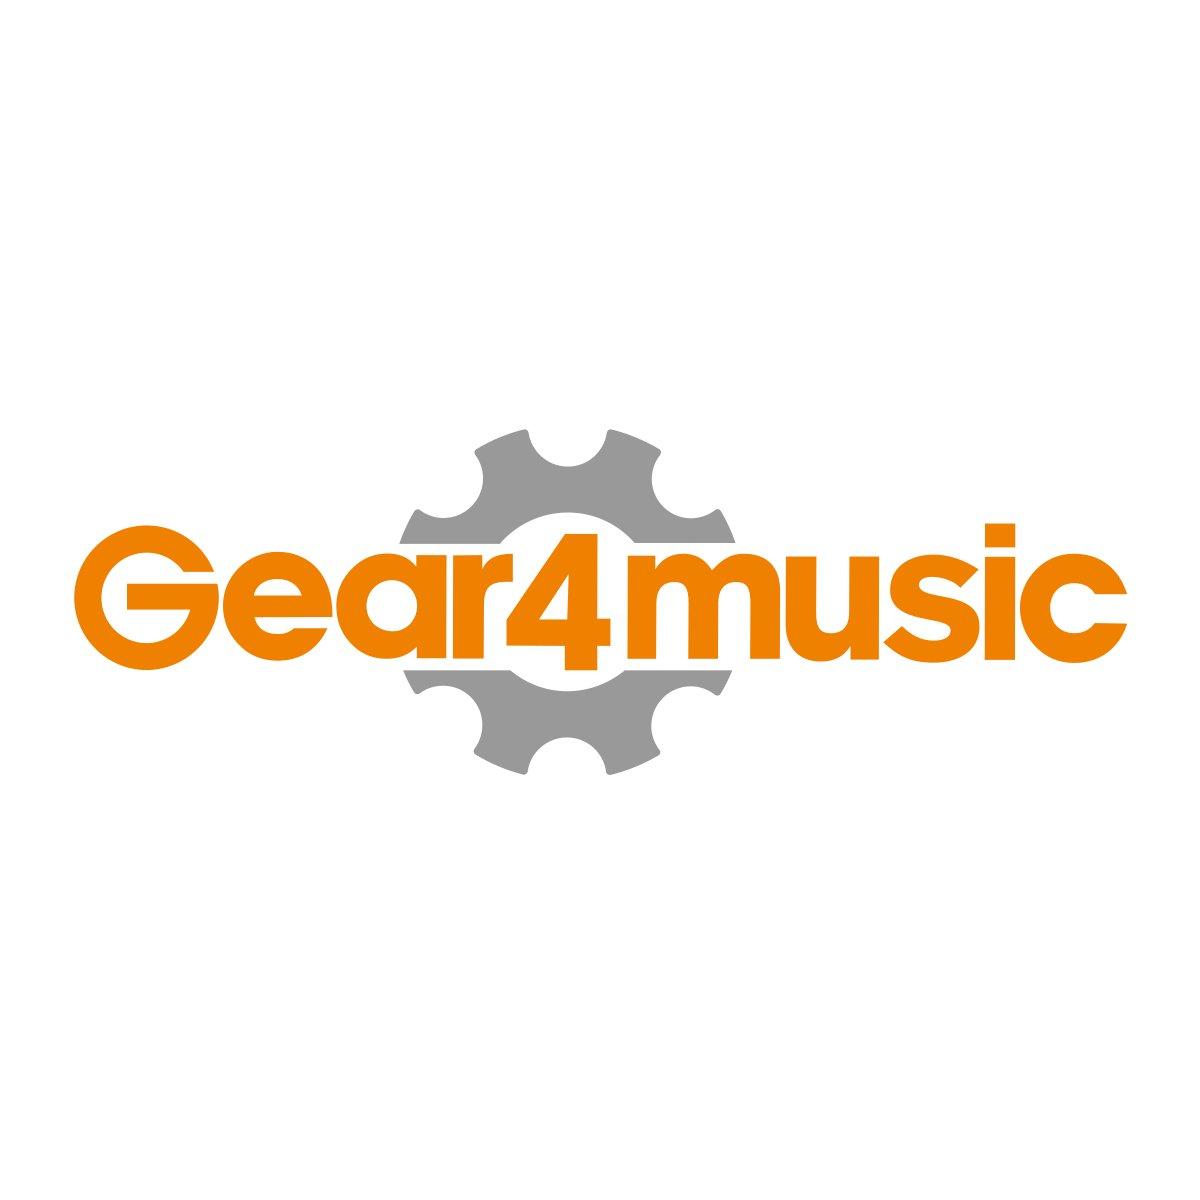 BDK-1 Full Size Starter Drum Kit by Gear4music, Main Image